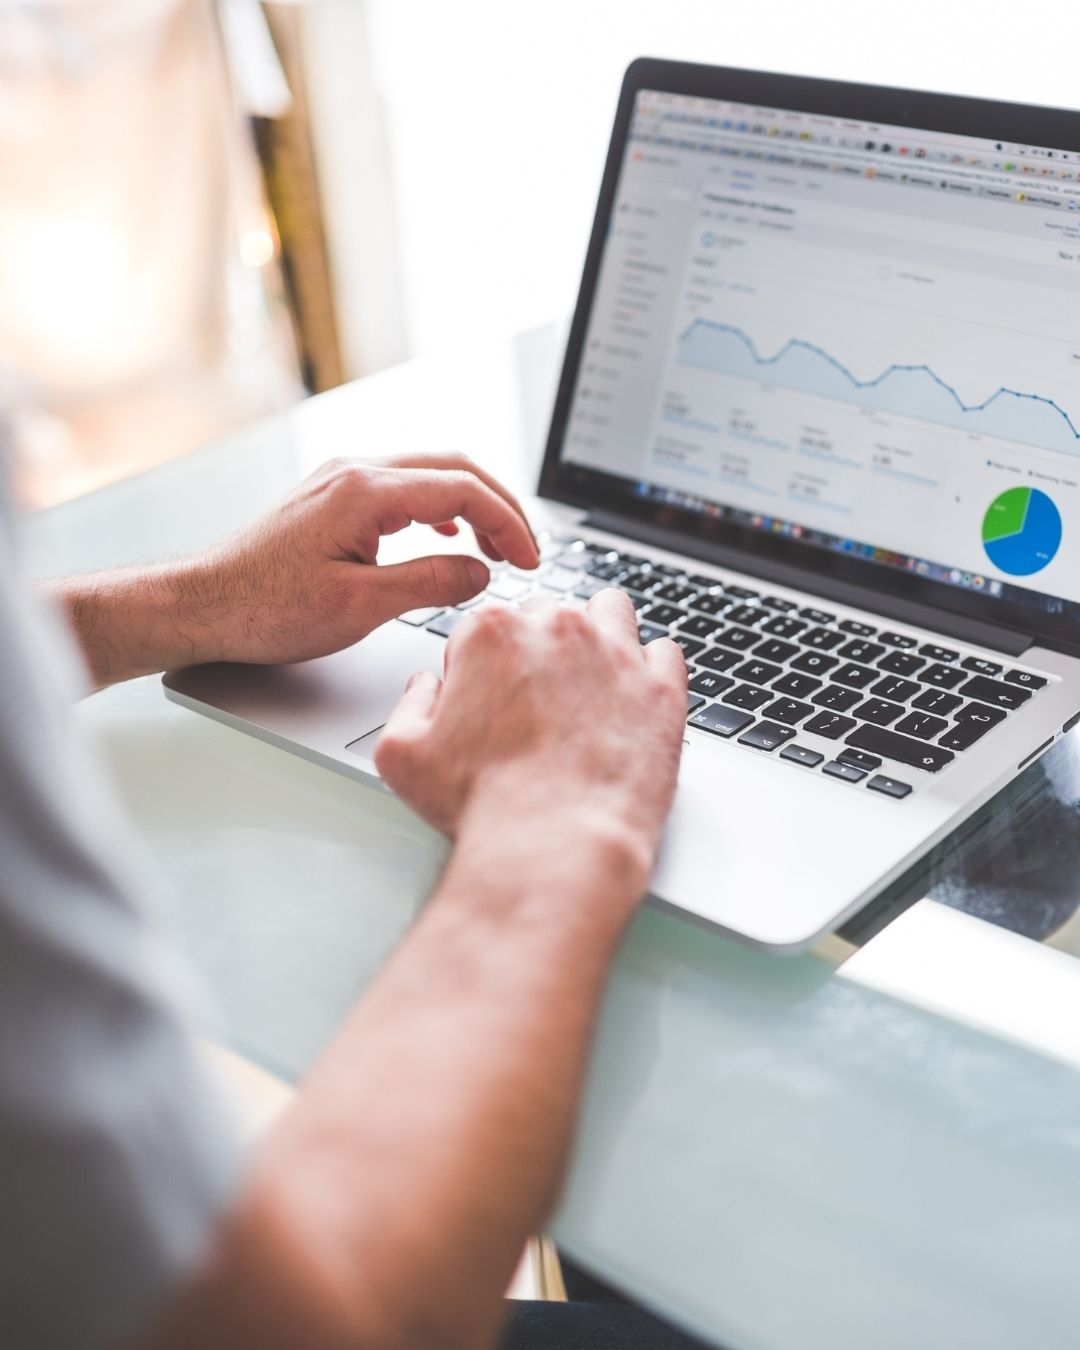 Paid Media Agency - Brick Media - Computer Showing Data and Charts